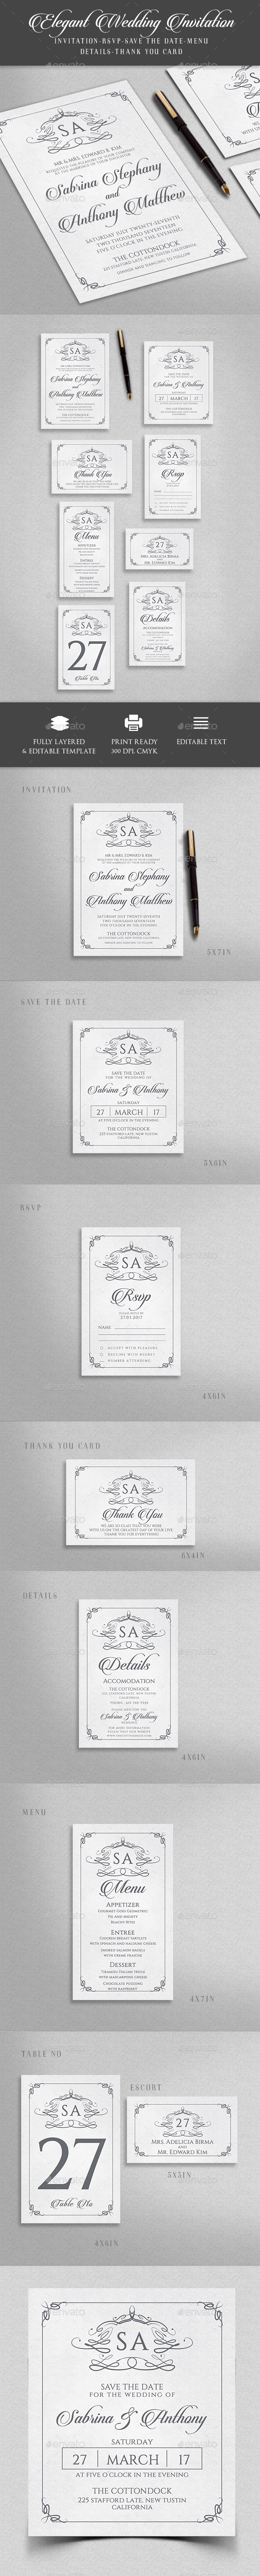 Elegant Wedding Invitation - Weddings Cards & Invites